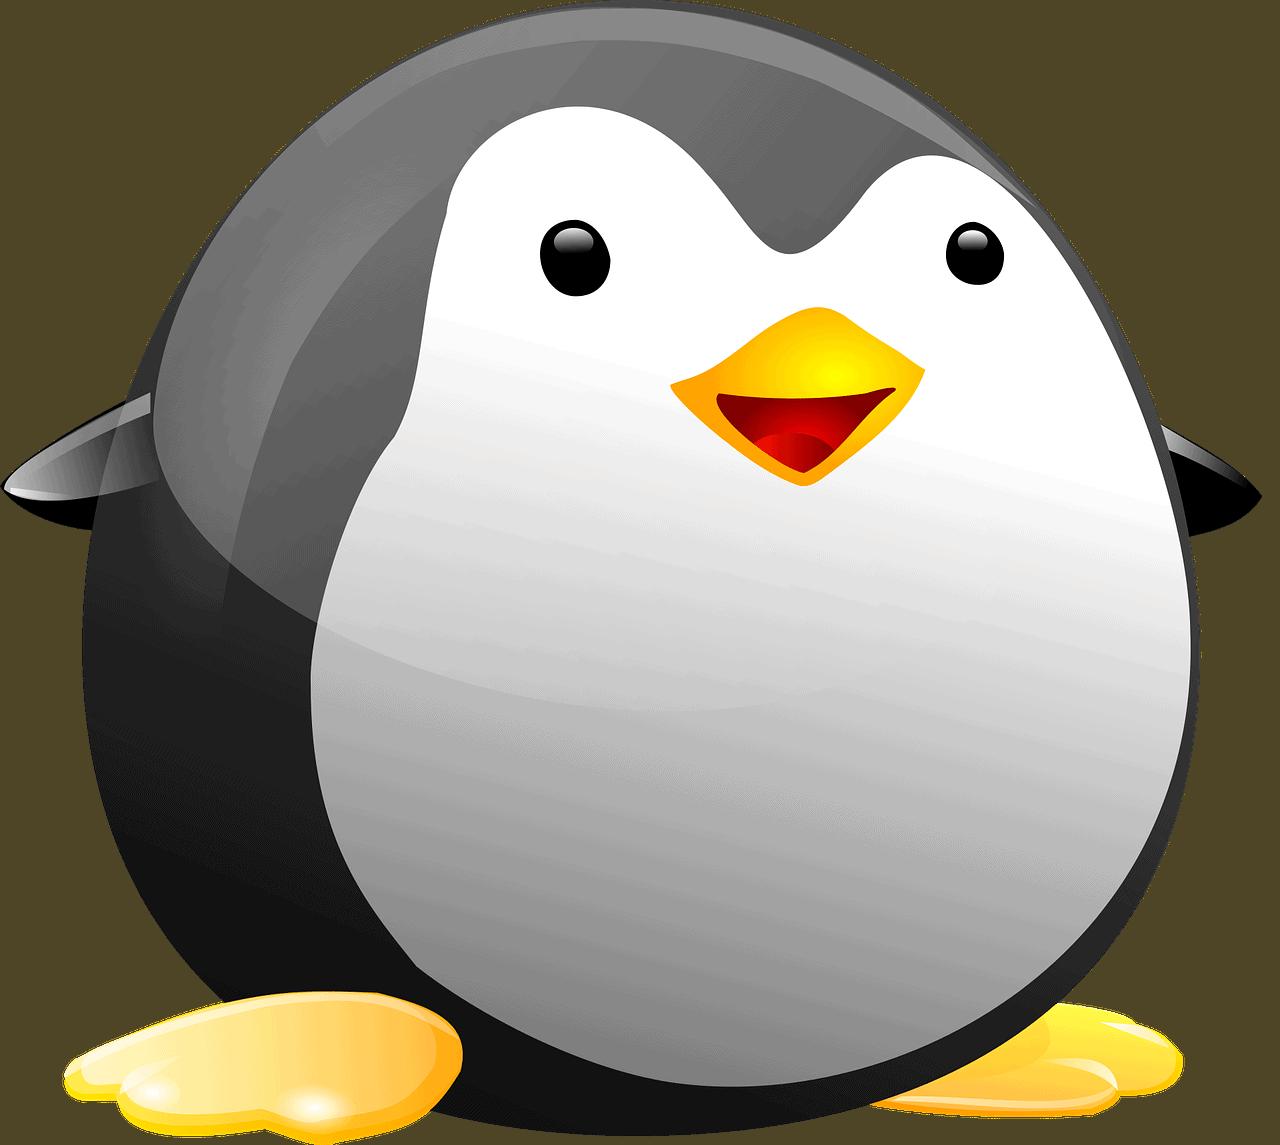 Black Linux Penguin Tiny Tux  - OpenClipart-Vectors / Pixabay